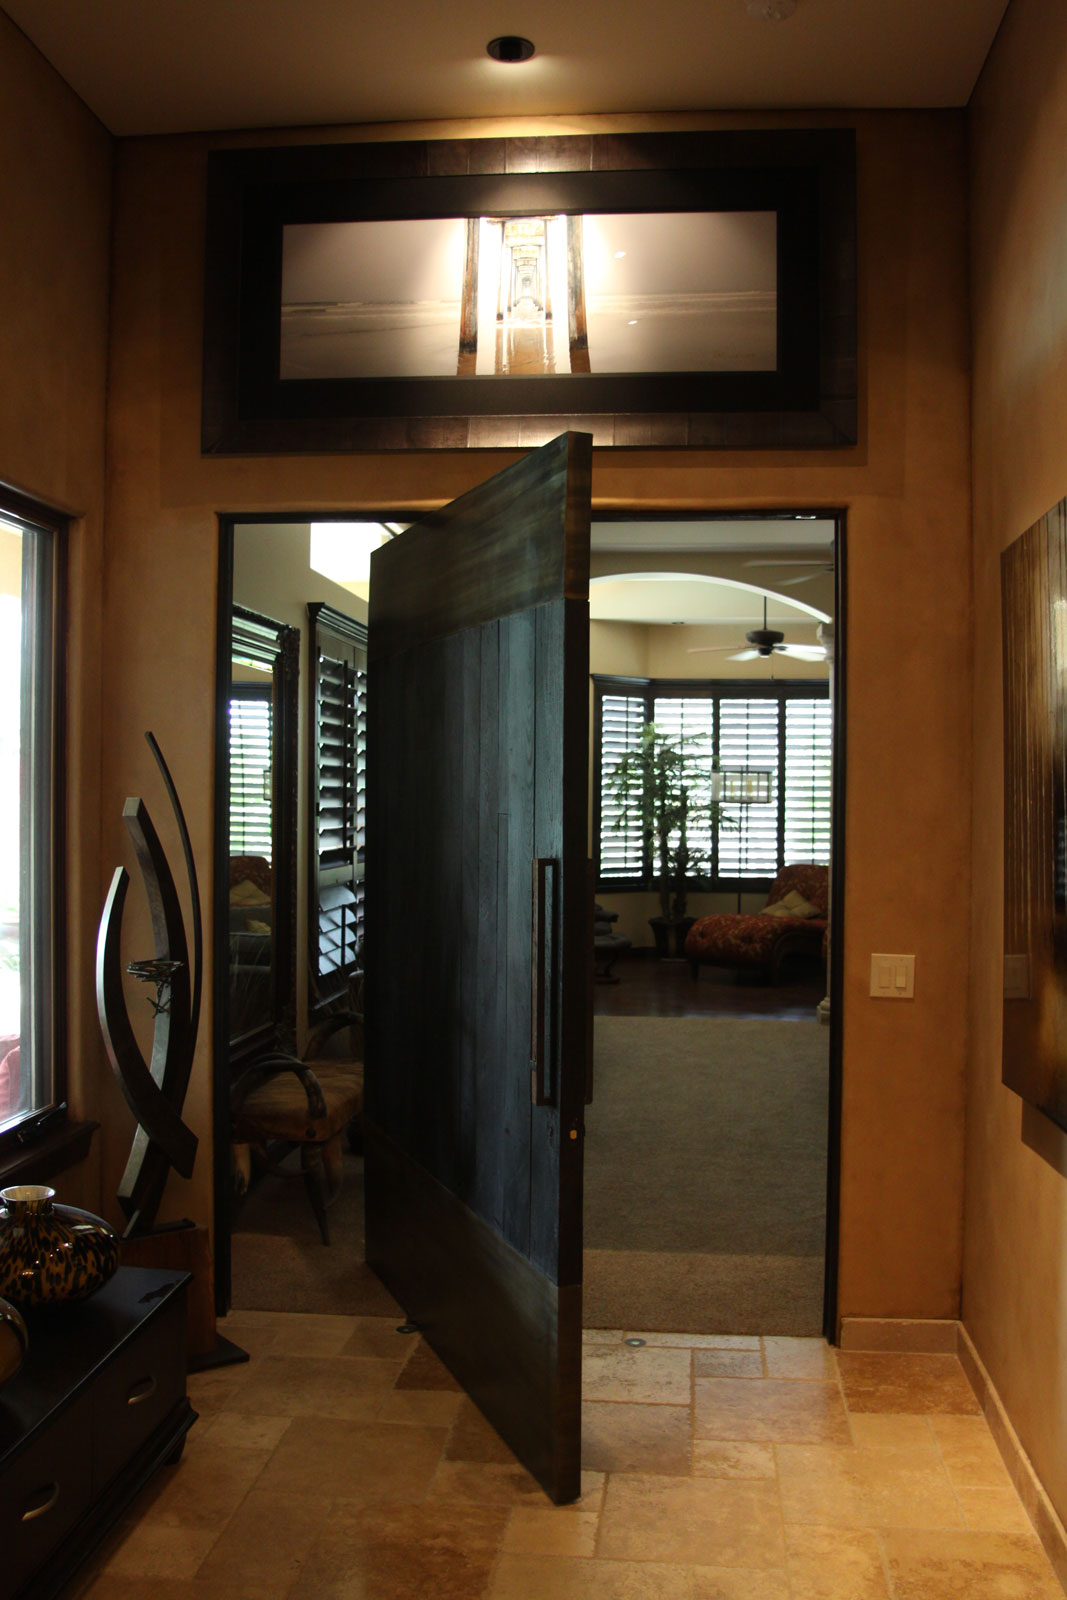 Shou Sugi Ban Pivoting door with patina steel